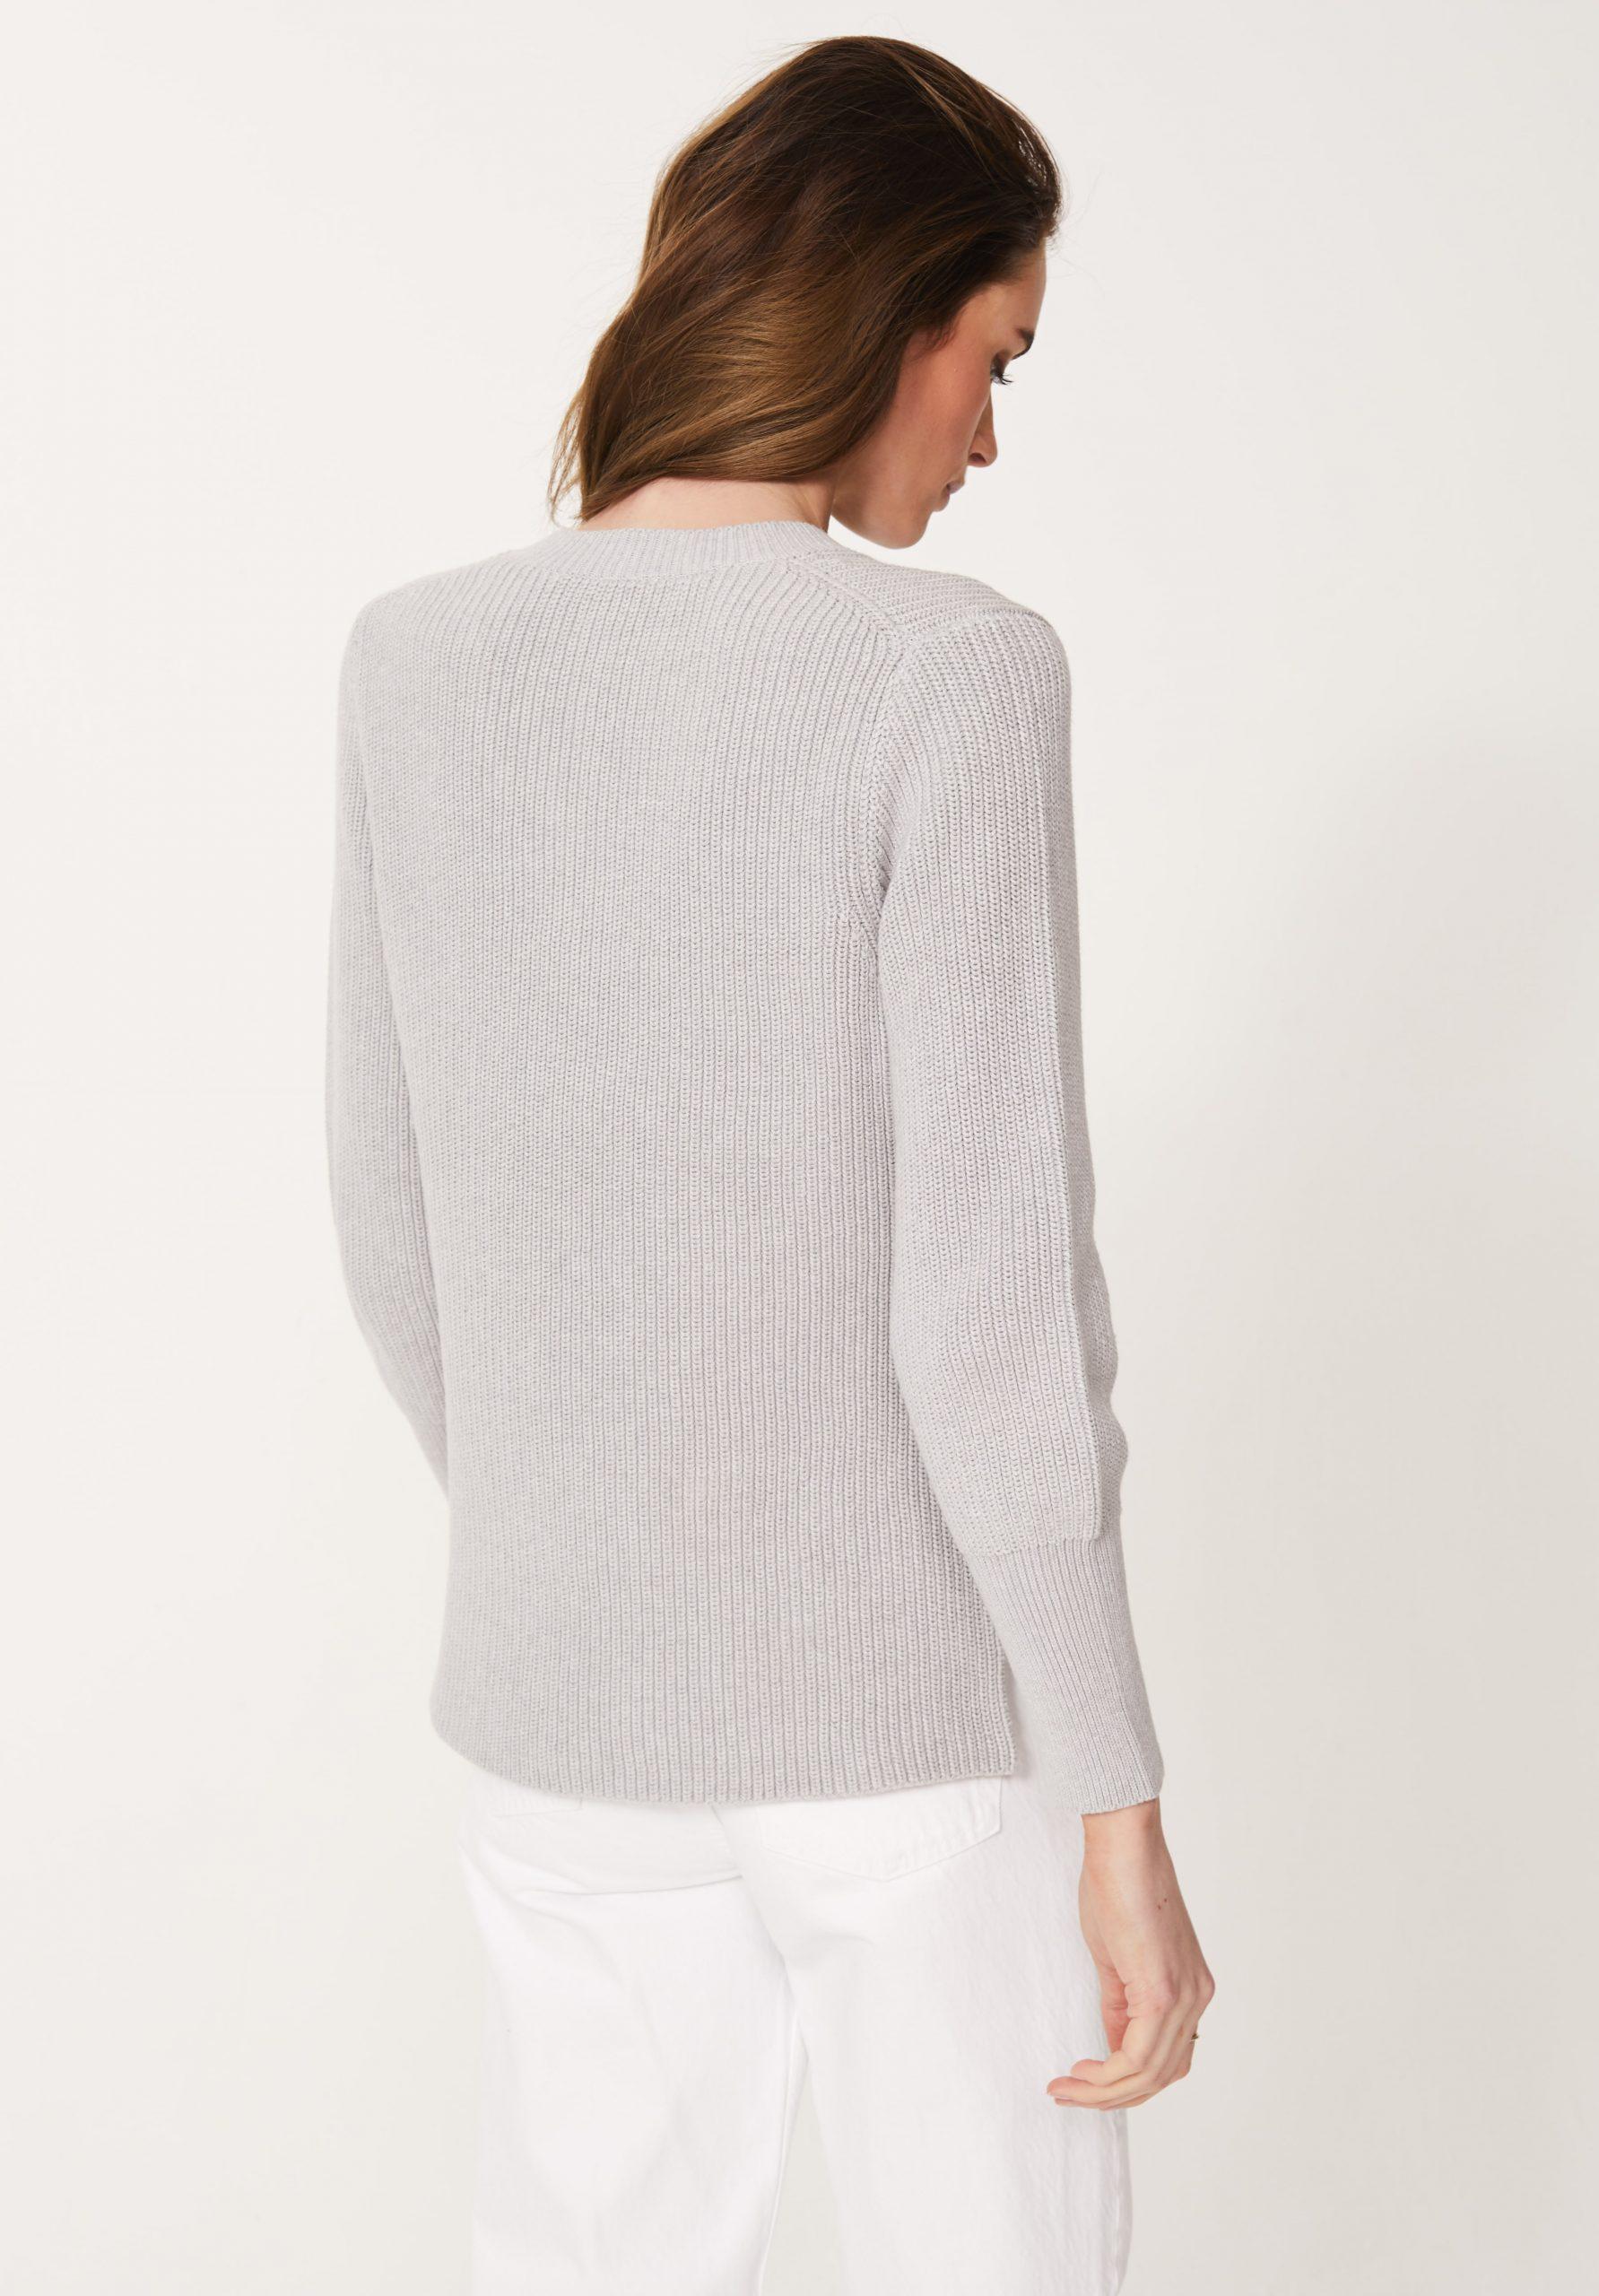 Cotton Rib V neck Jumper in Silver Marl